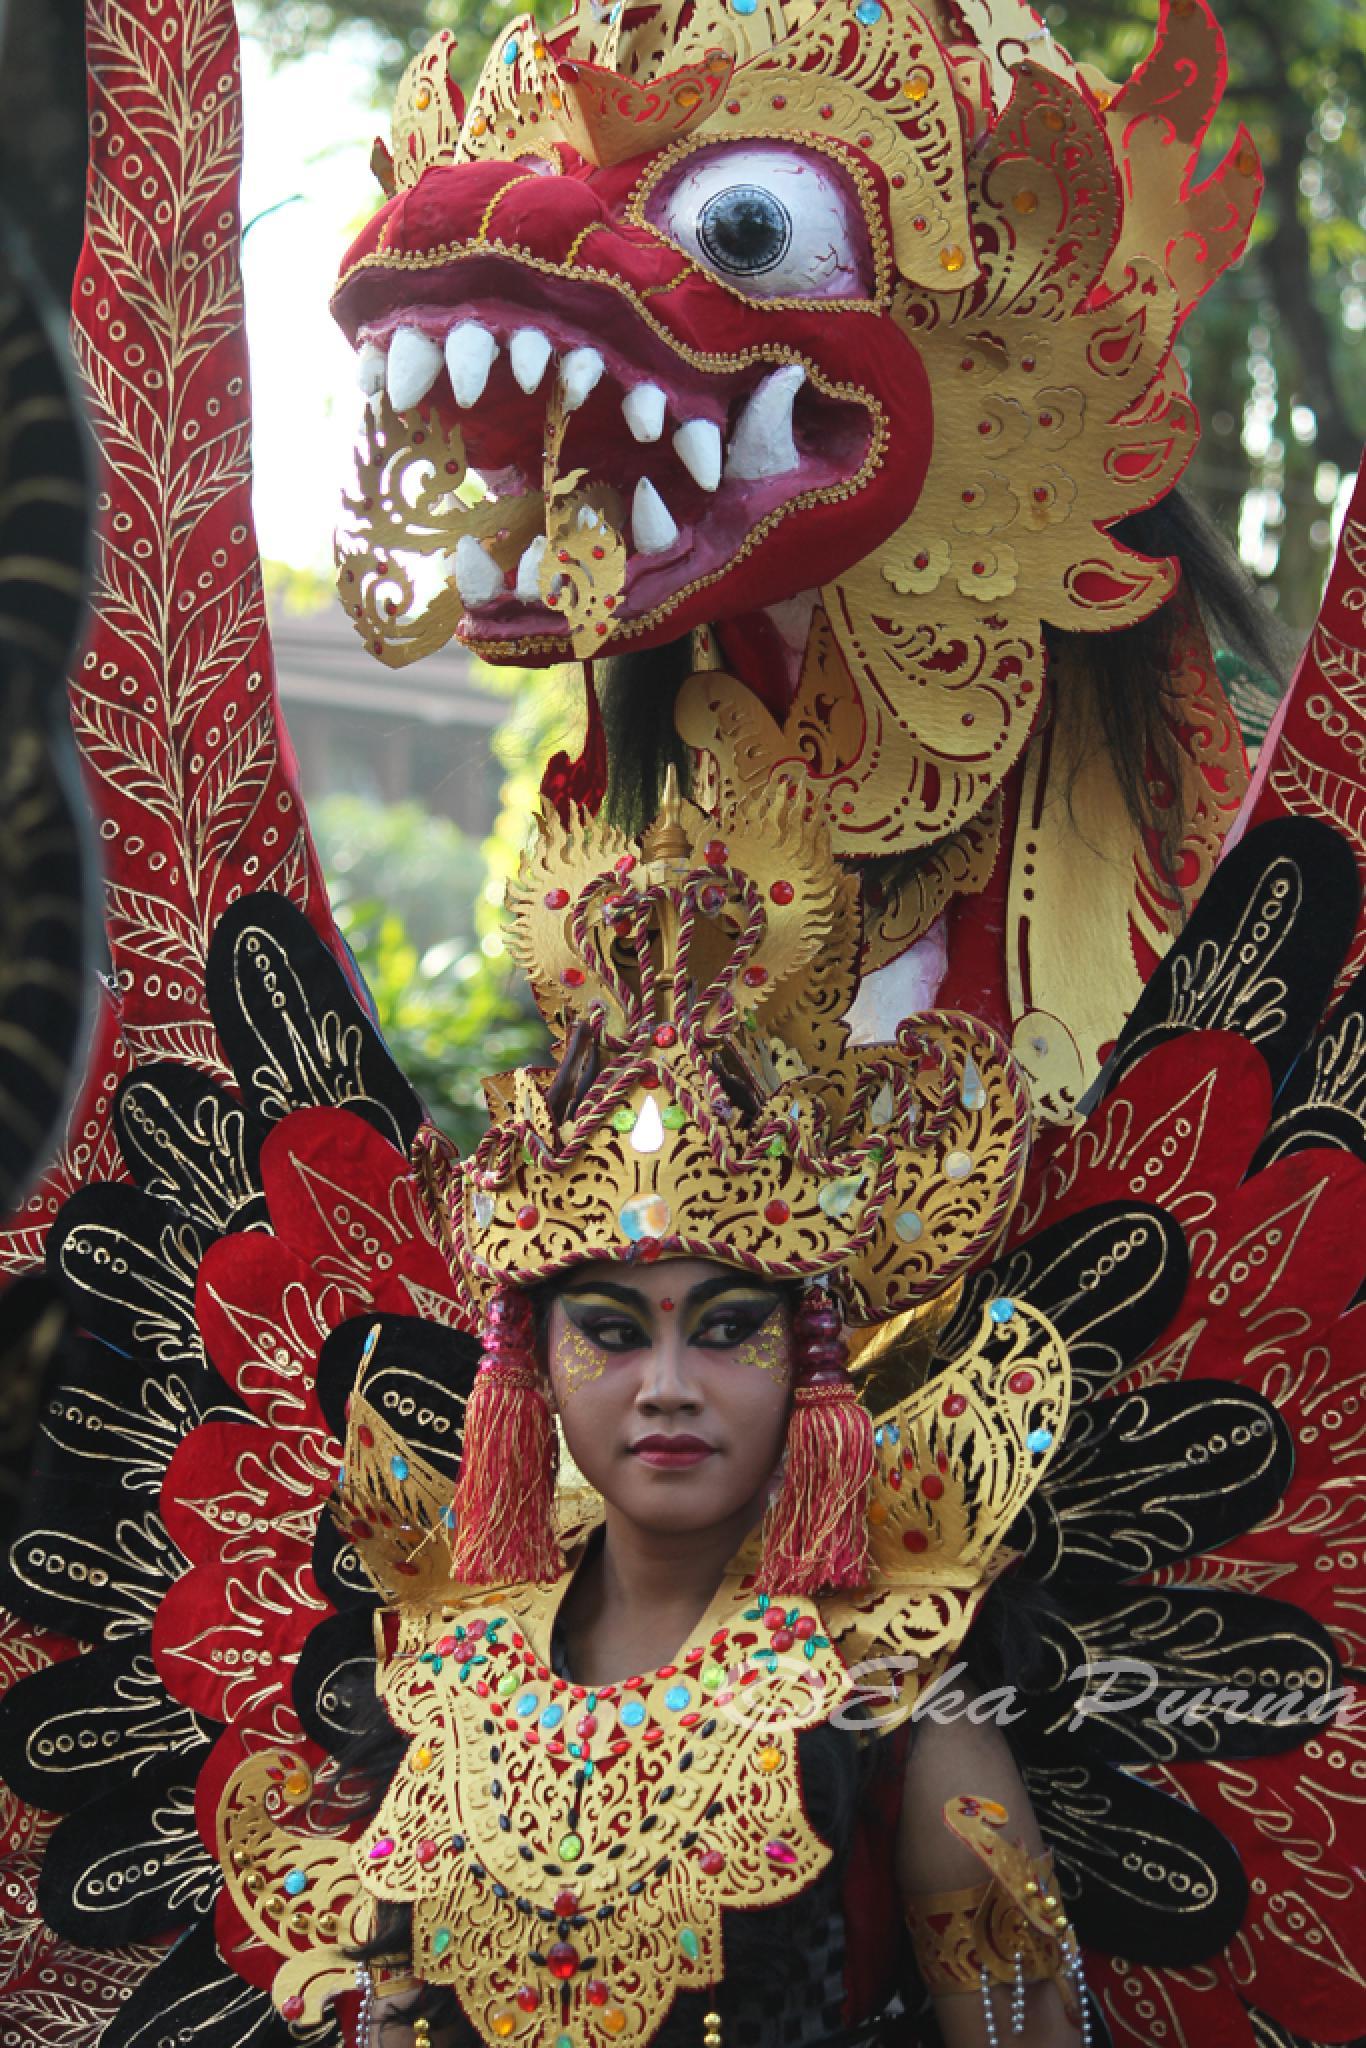 Red Dragon  by Eka Purna Sumeika